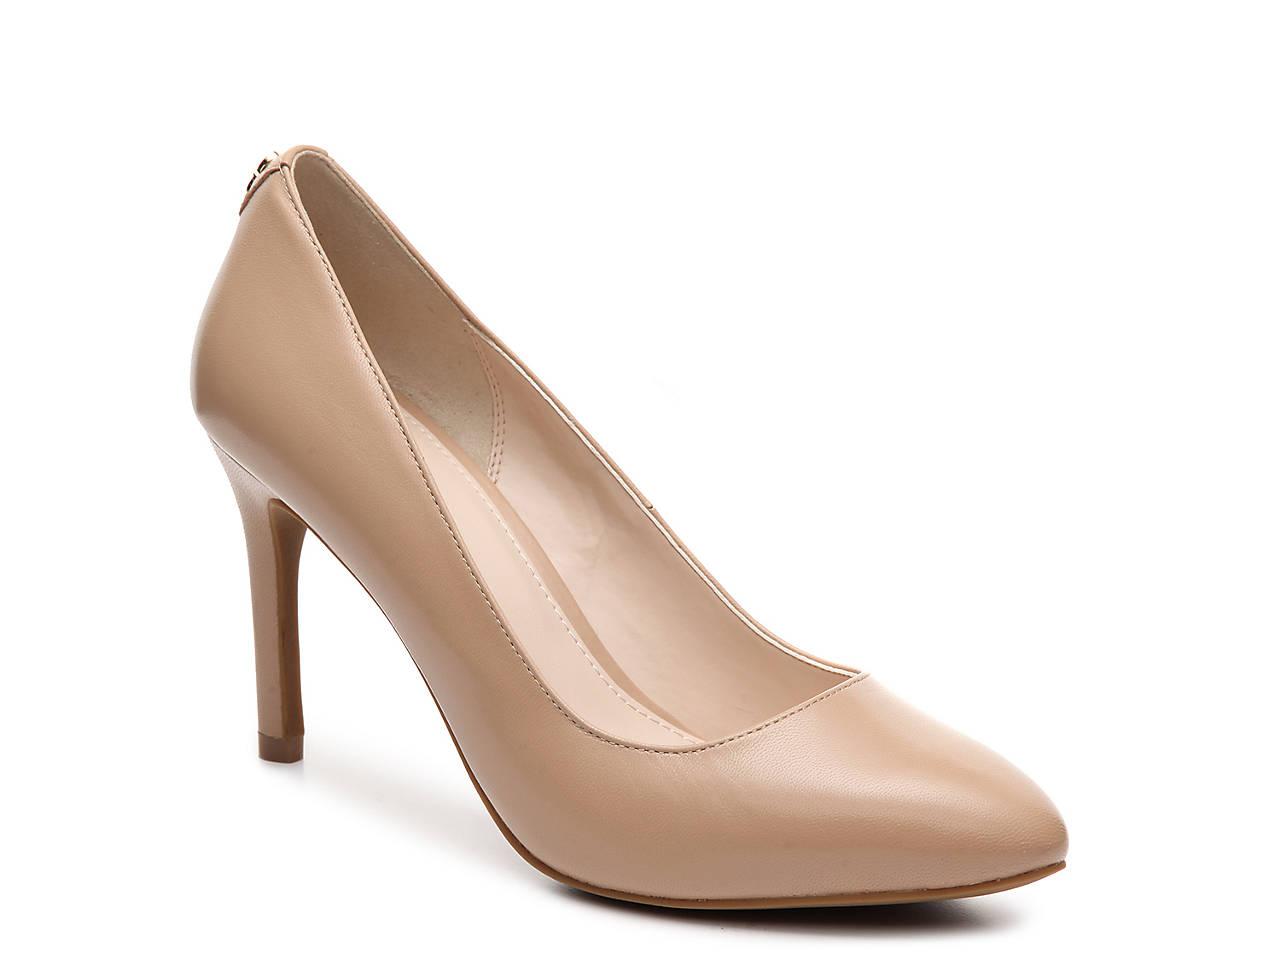 79e39335d3c Cole Haan Gwenda Pump Women s Shoes